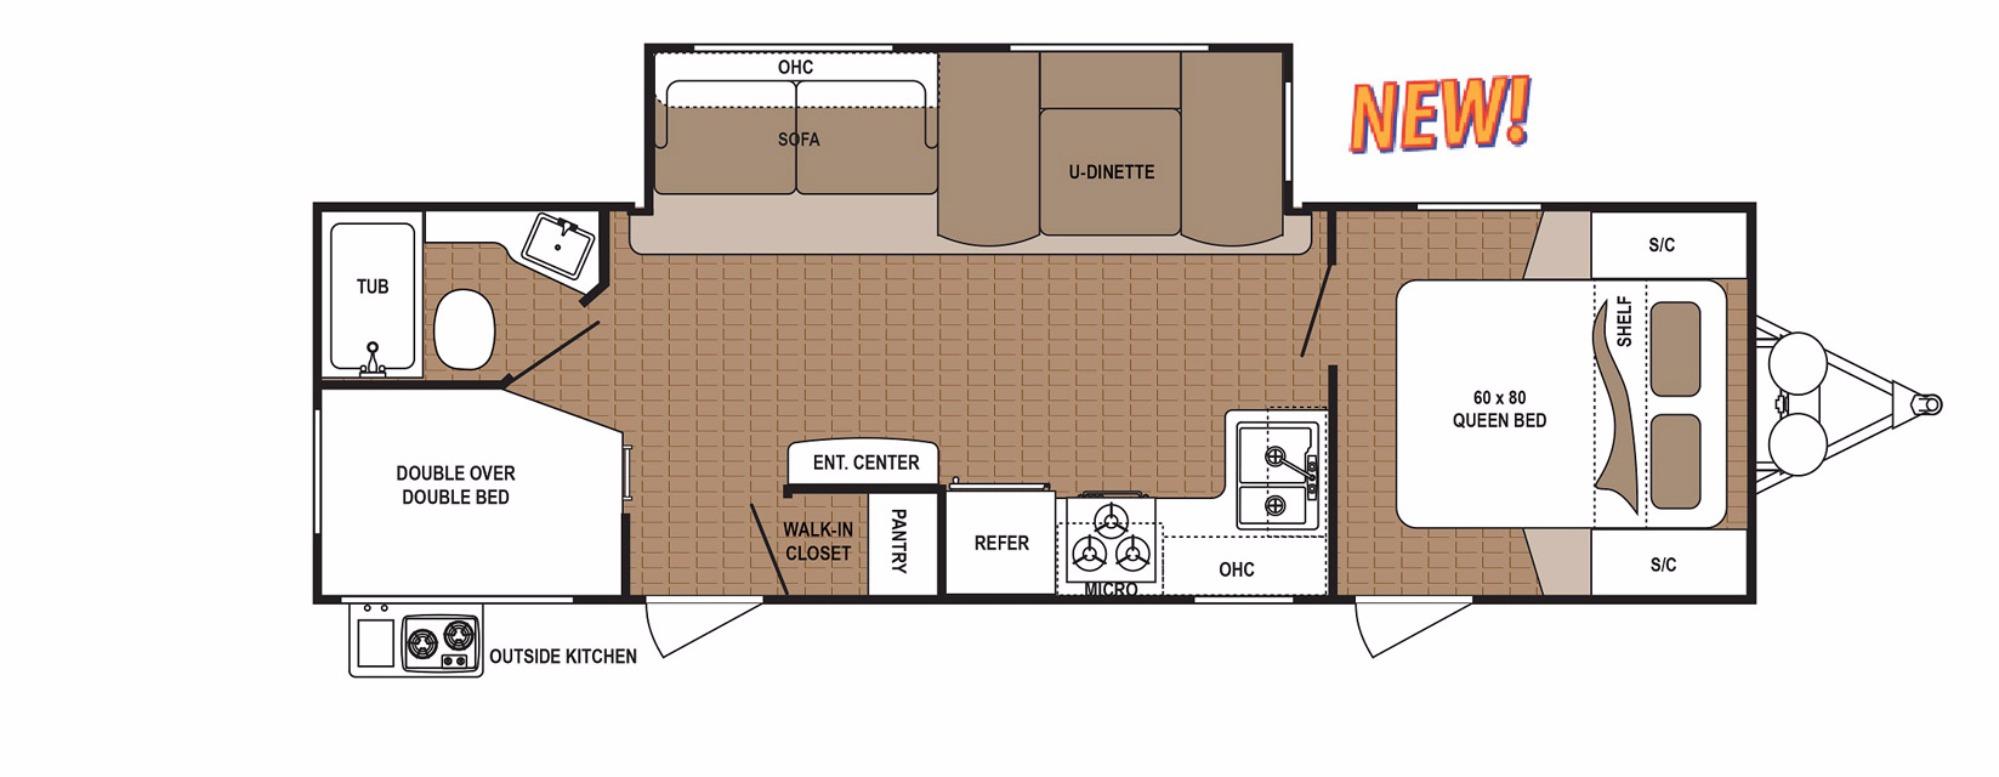 View Floor Plan for 2018 DUTCHMEN ASPEN TRAIL 2790BHS